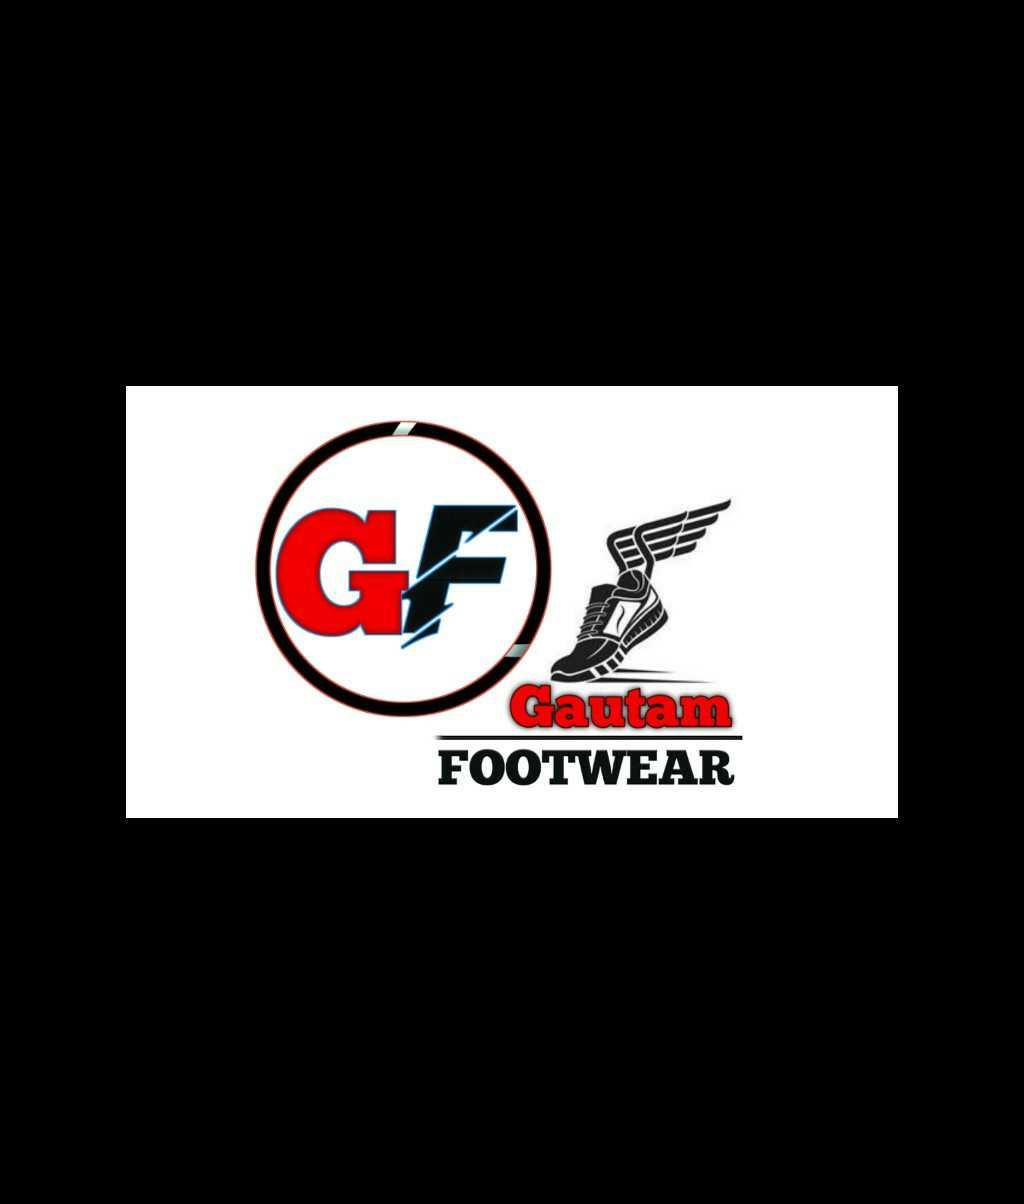 Gautam Footwear